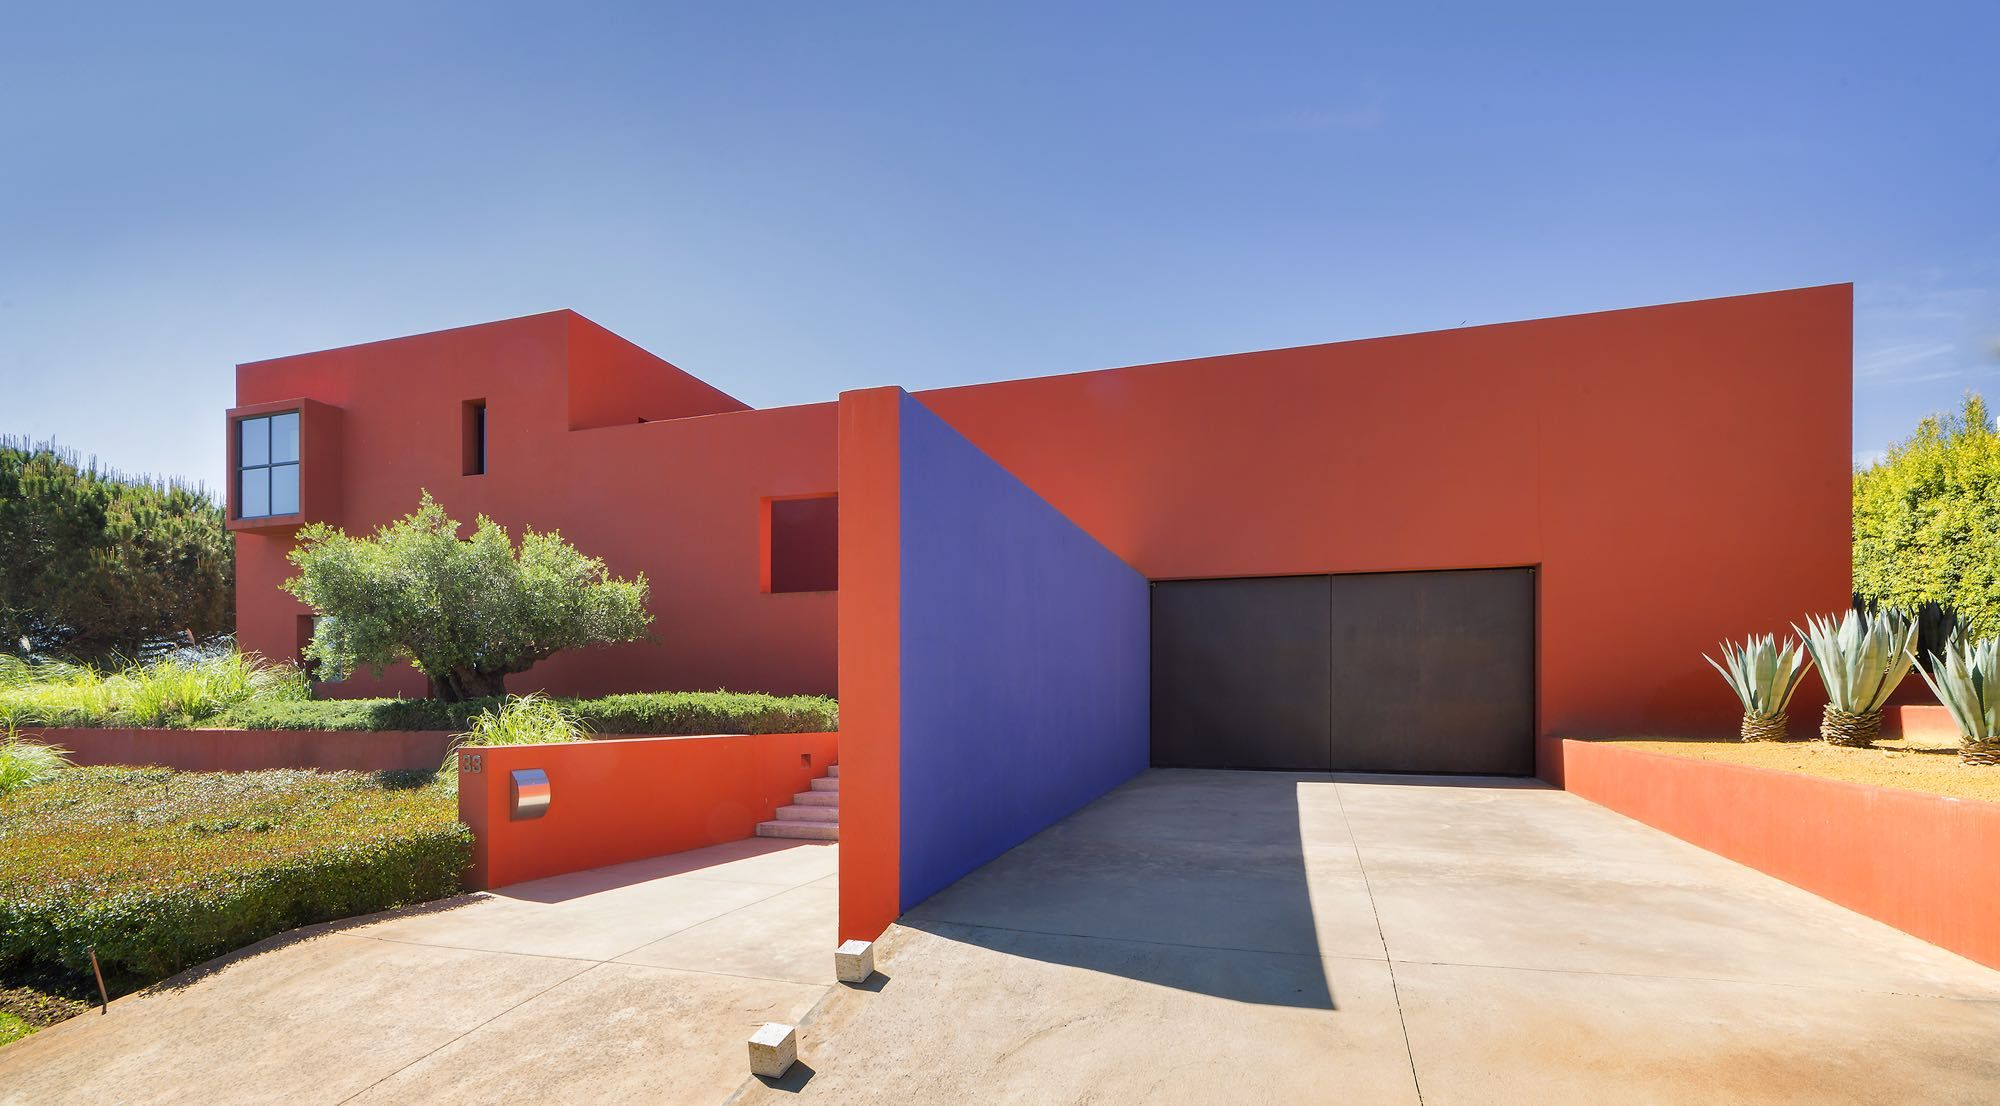 Legorreta villa sotogrande awquitectura neo mexicana - Arquitecto sotogrande ...